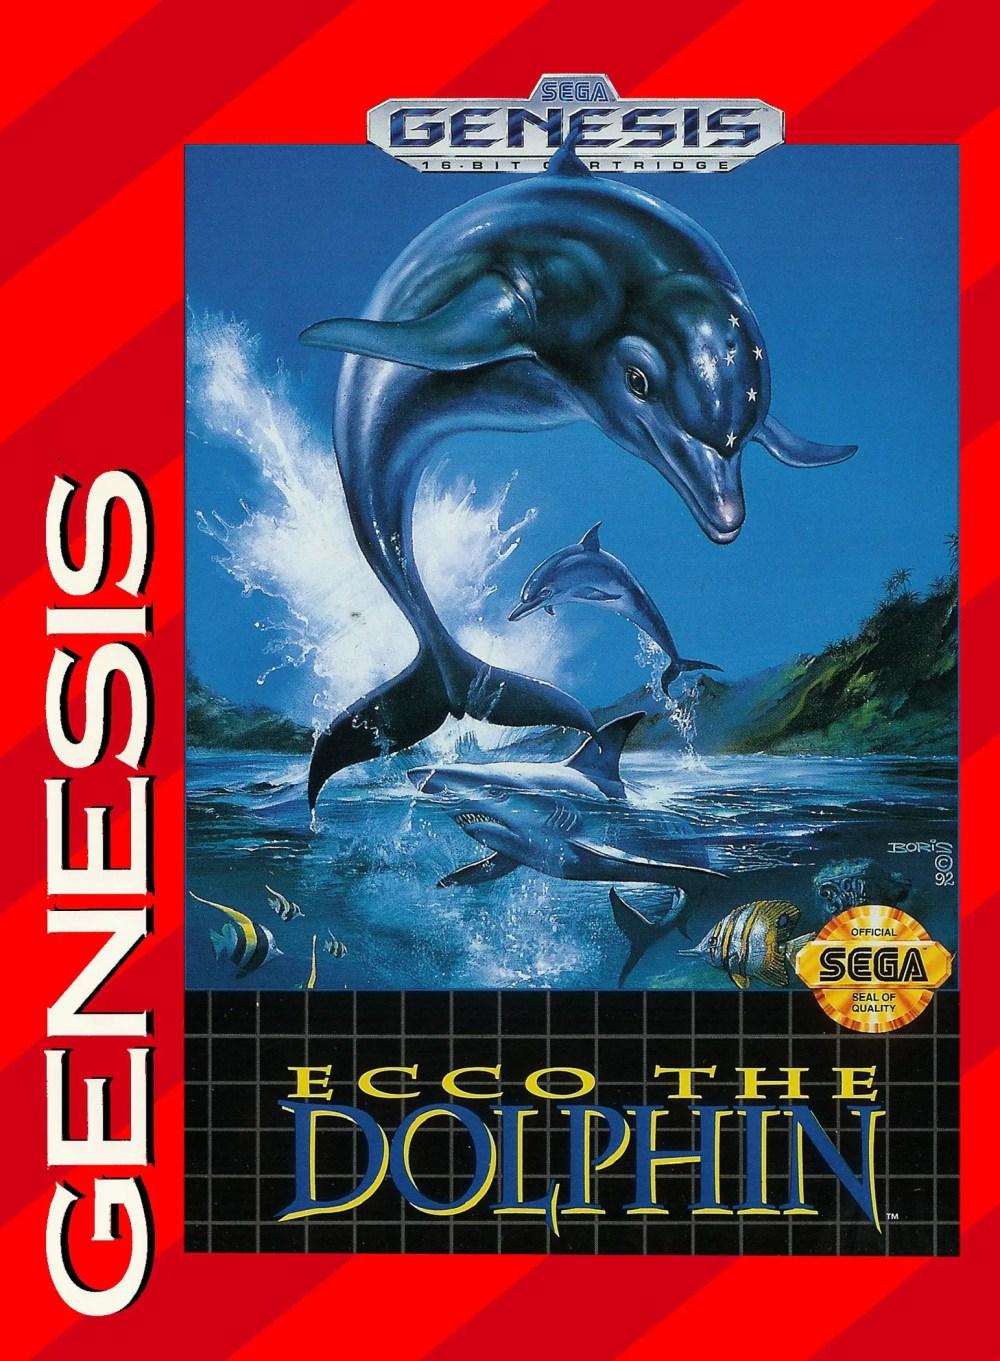 Ecco the Dolphin for Sega Genesis